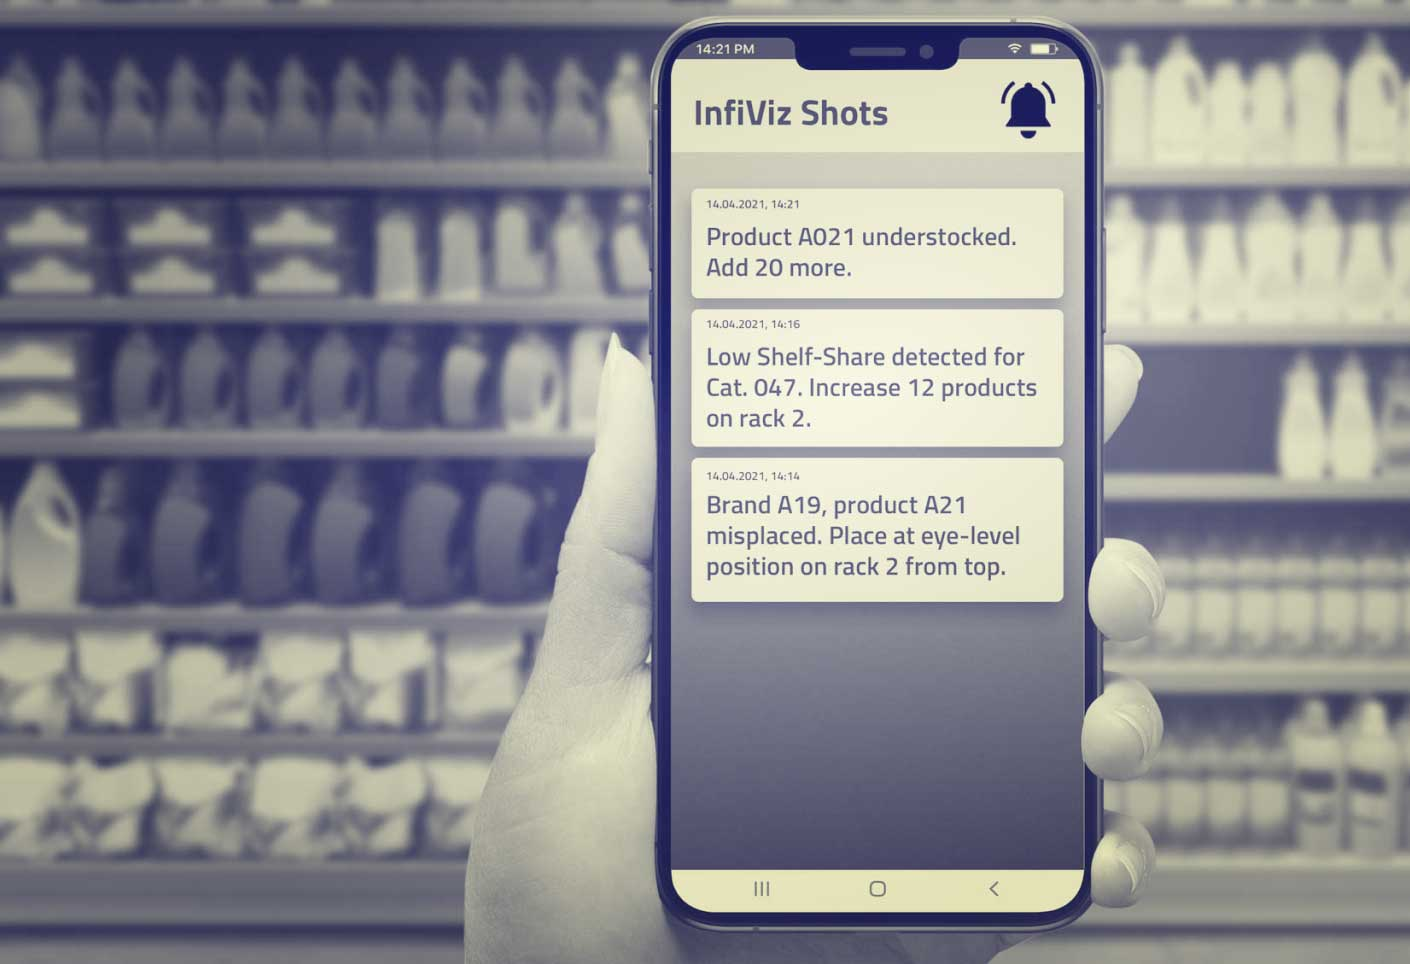 Merchandizer app for retail execution